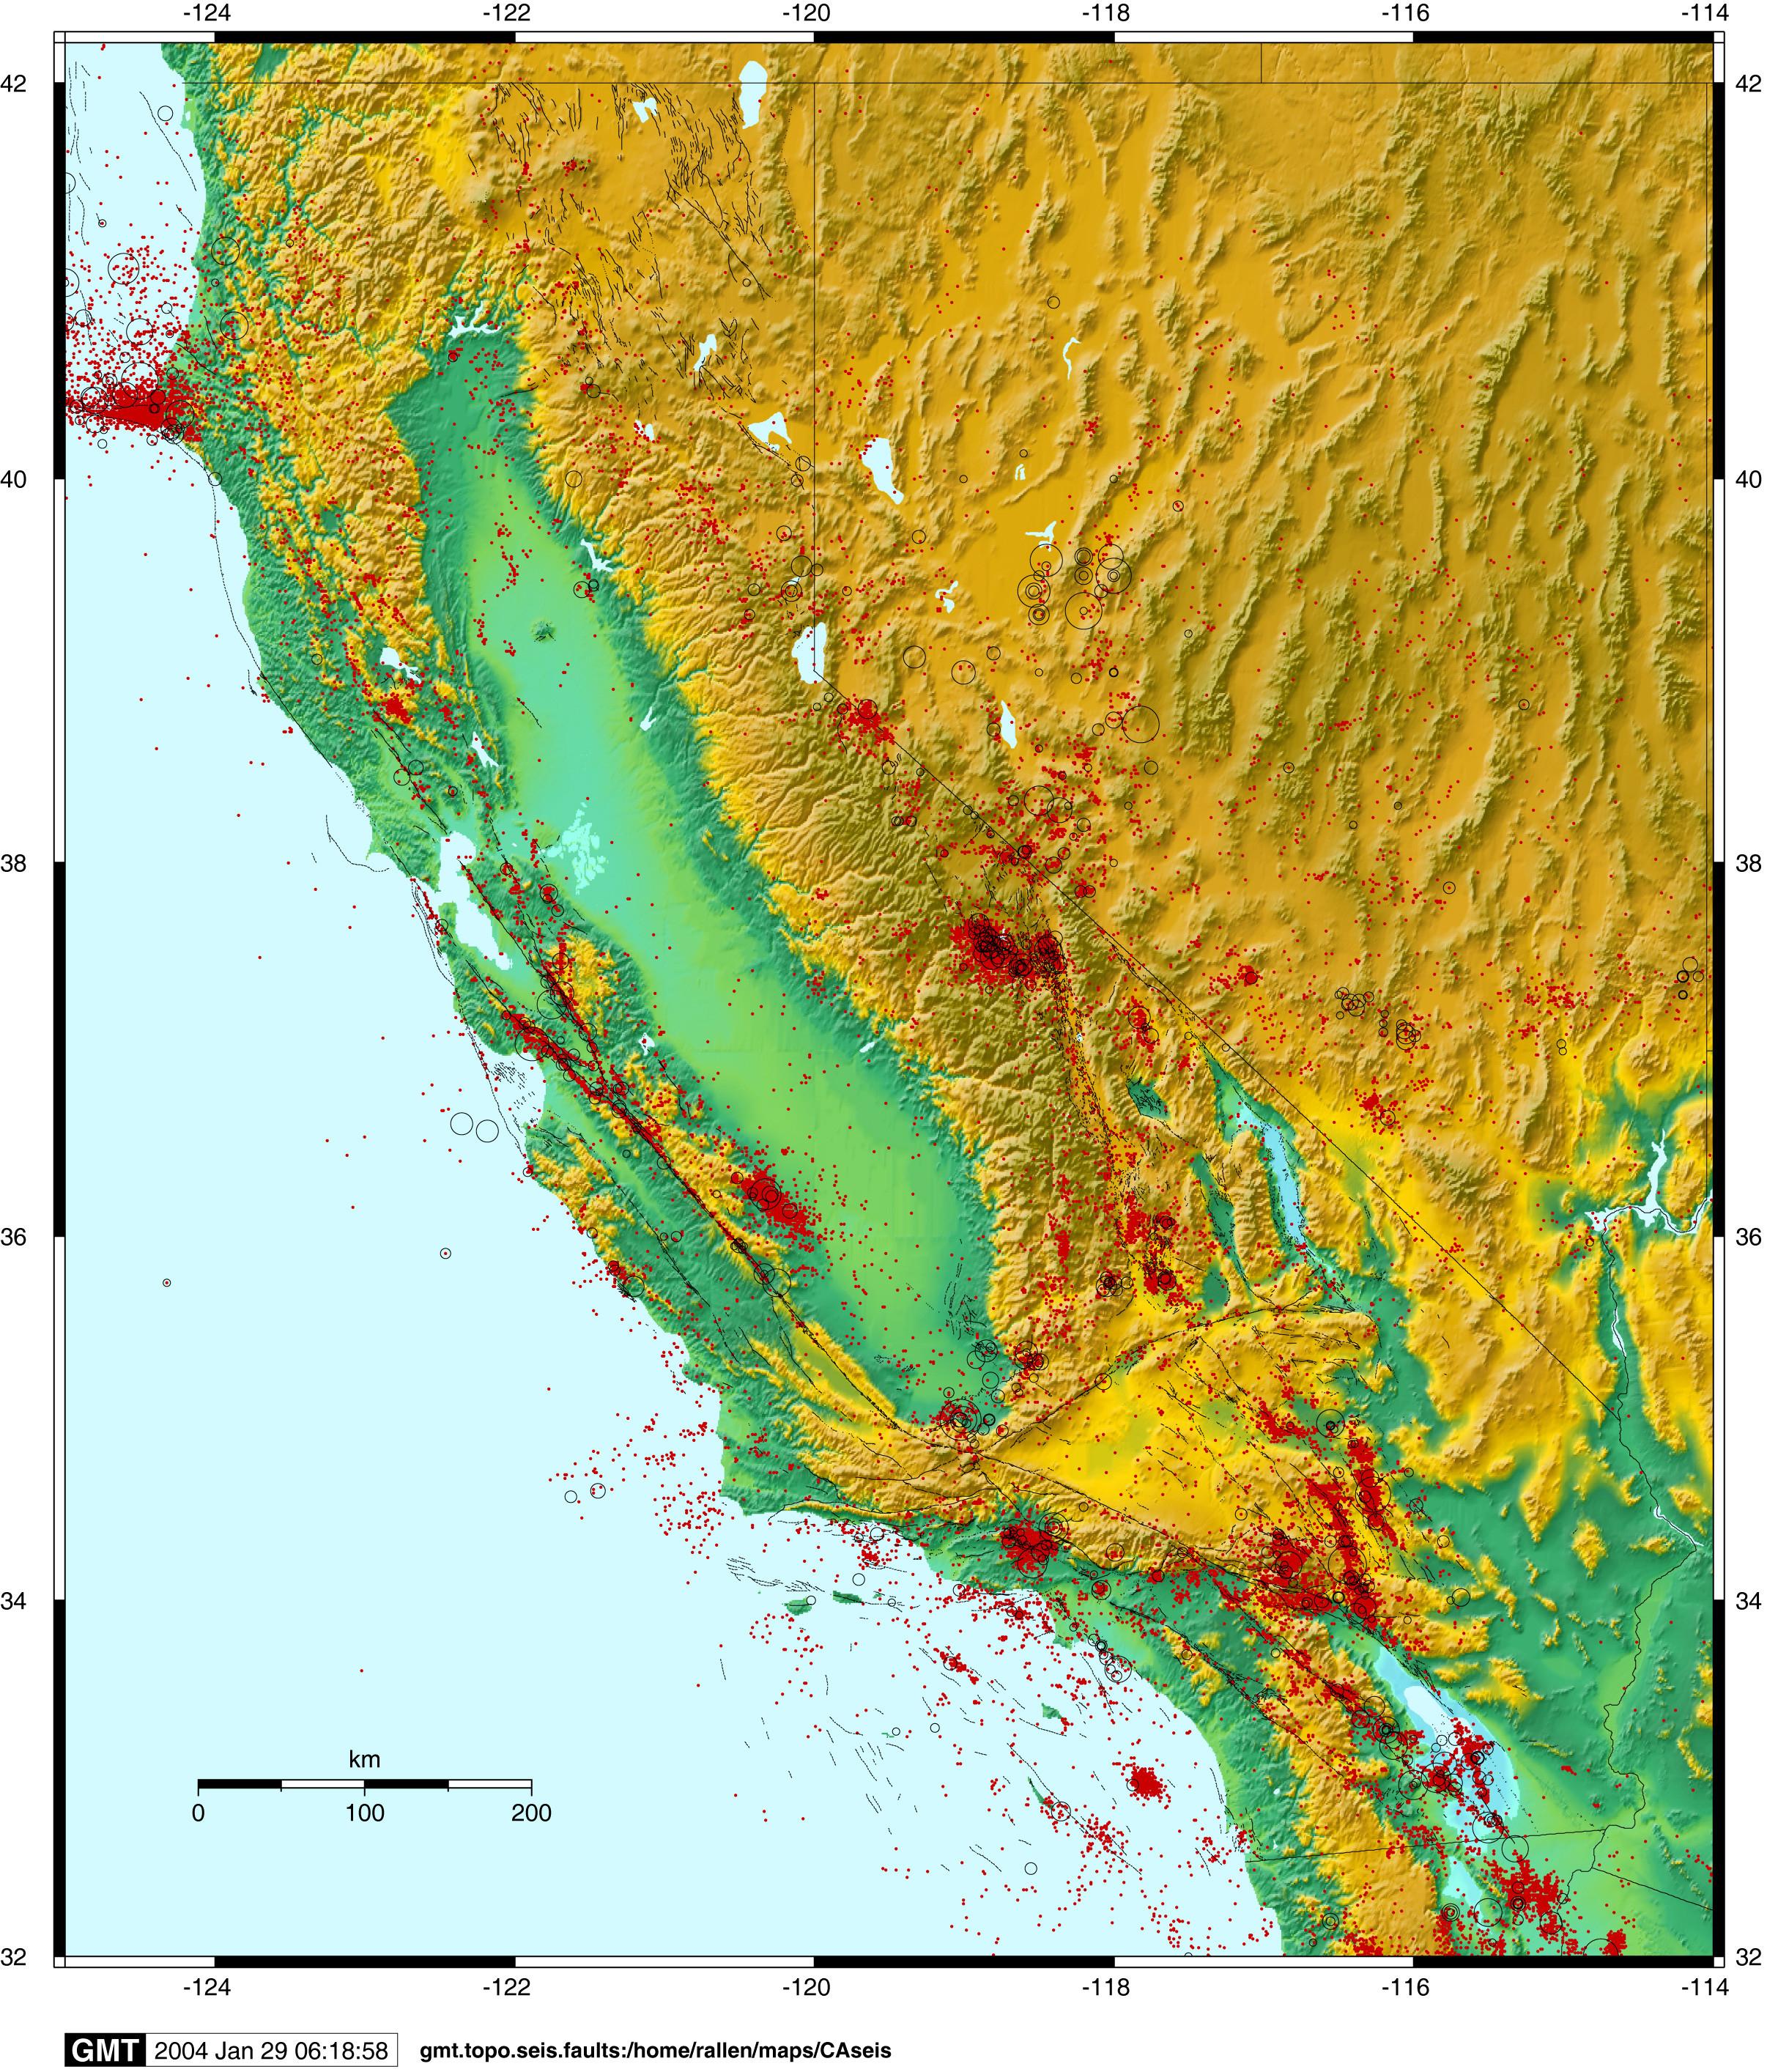 Usgs California Nevada Earthquake Map Outline Richard Allen - Usgs California Nevada Earthquake Map